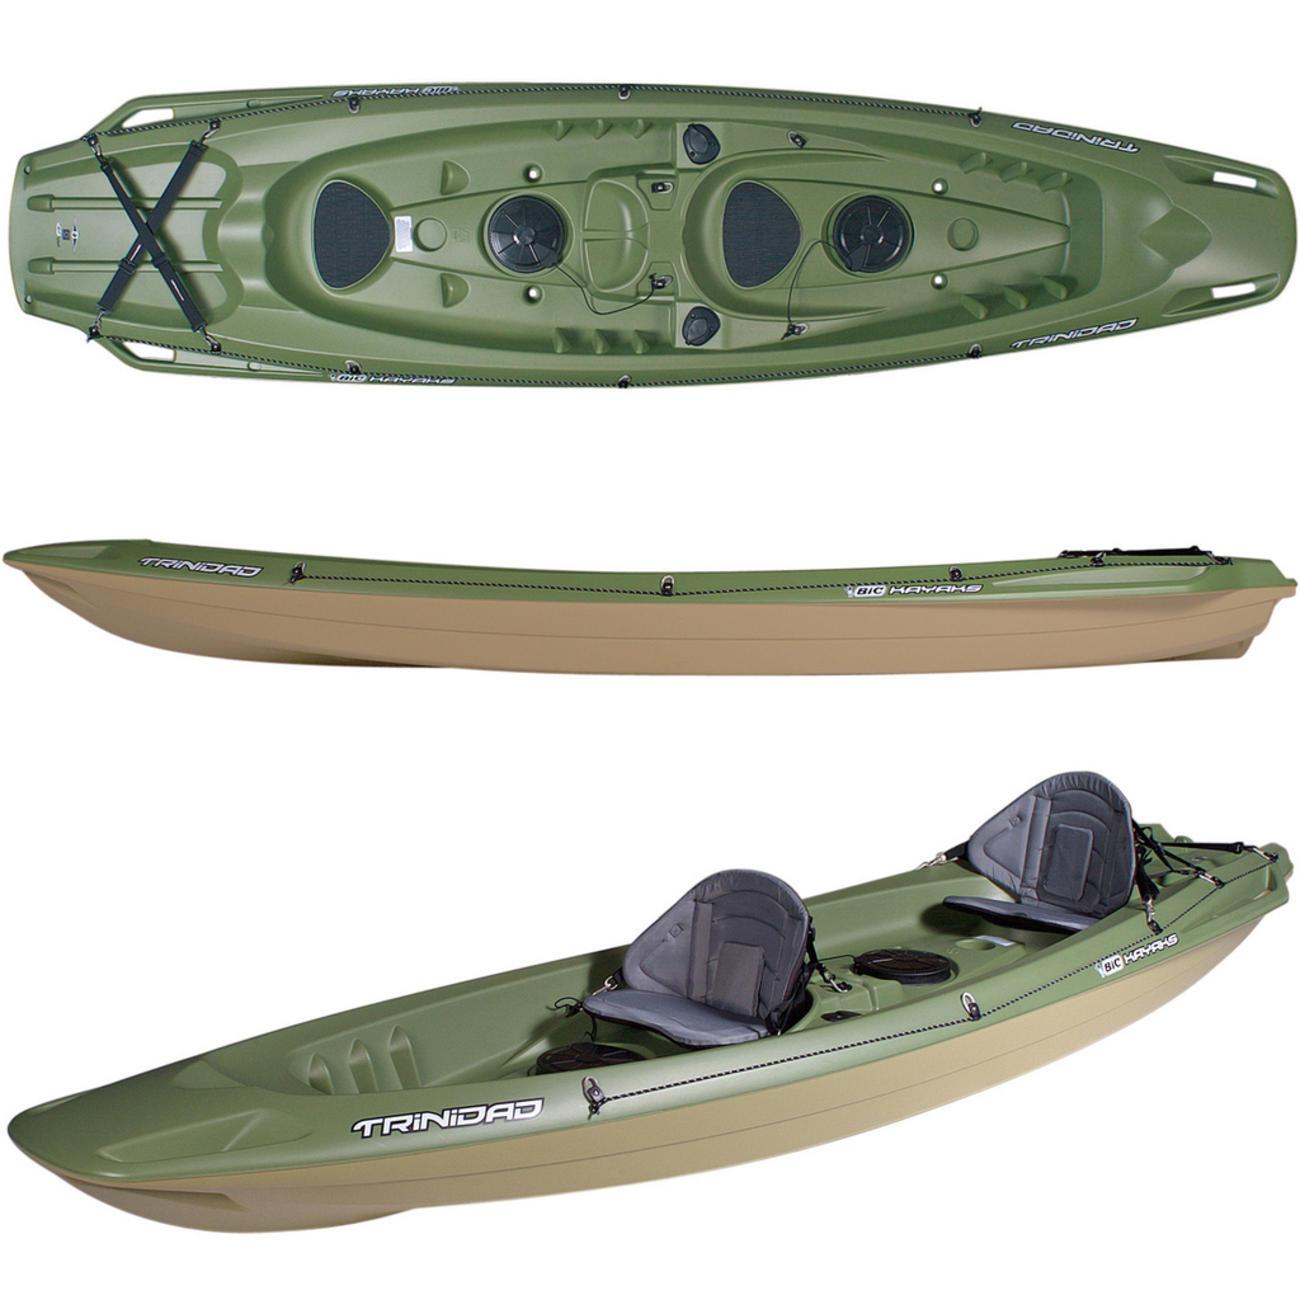 Trinidad Fishing Green 2人乗りフィッシングカヤック